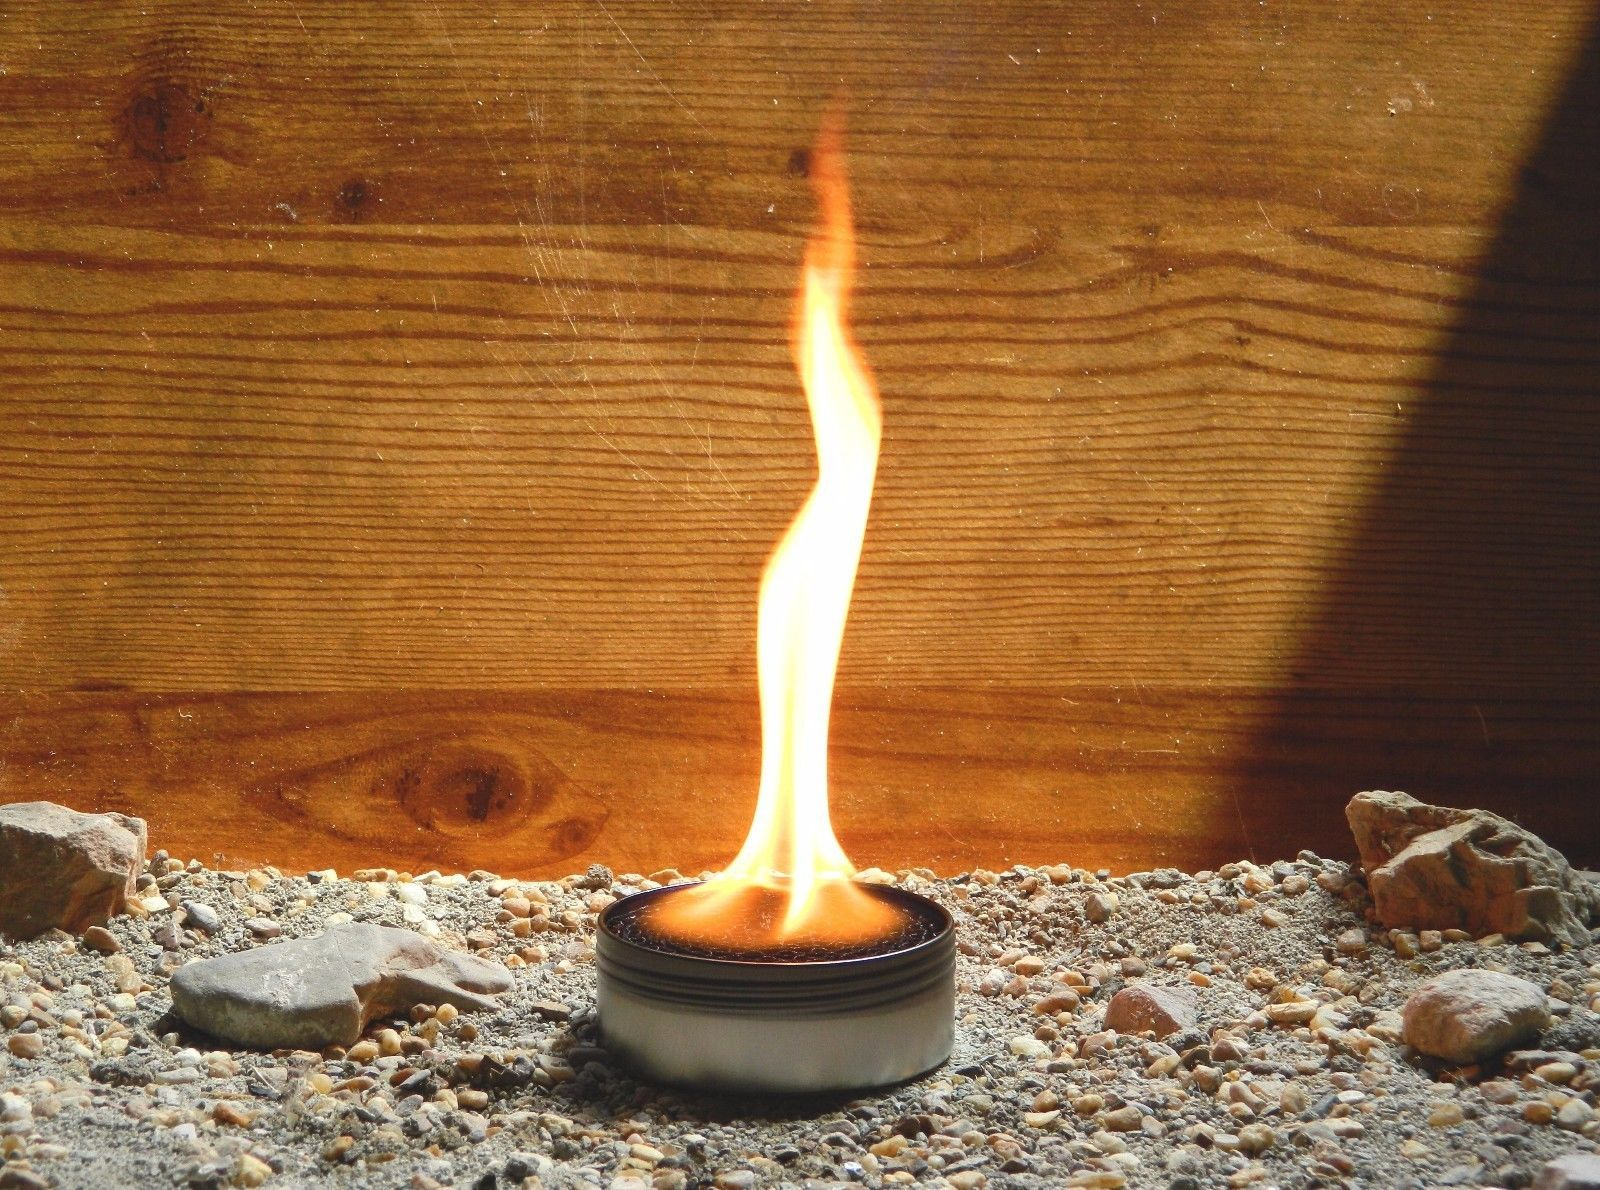 Outdoor Survival Heat /& Fire Buddy Burner Combo 3Hr Eco 2Hr Mini 3Hr /& 2Hr